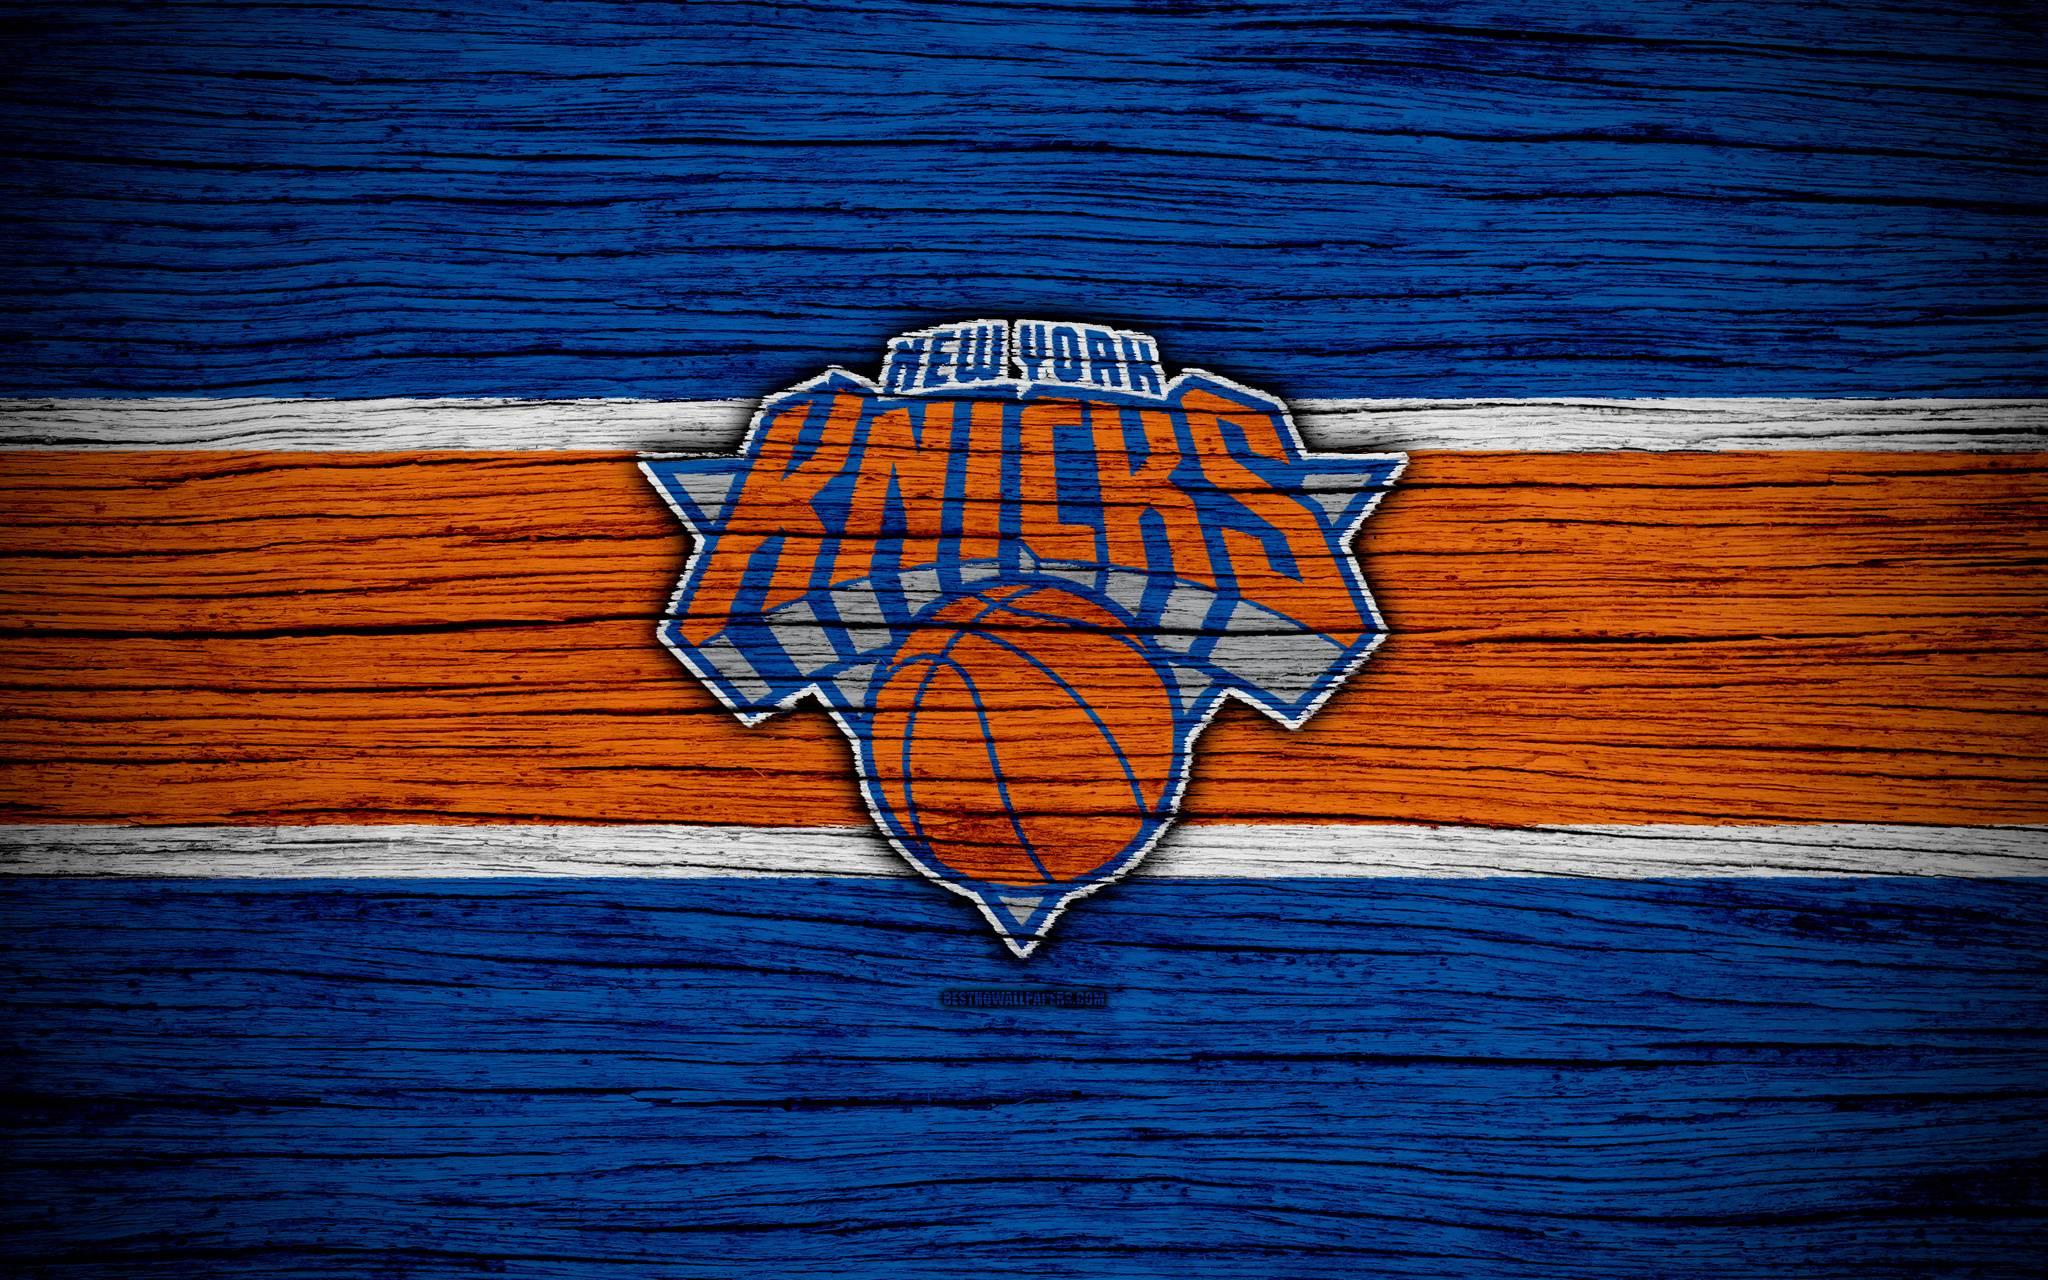 New York Knicks wallpaper by ElnazTajaddod - c1 - Free on ...